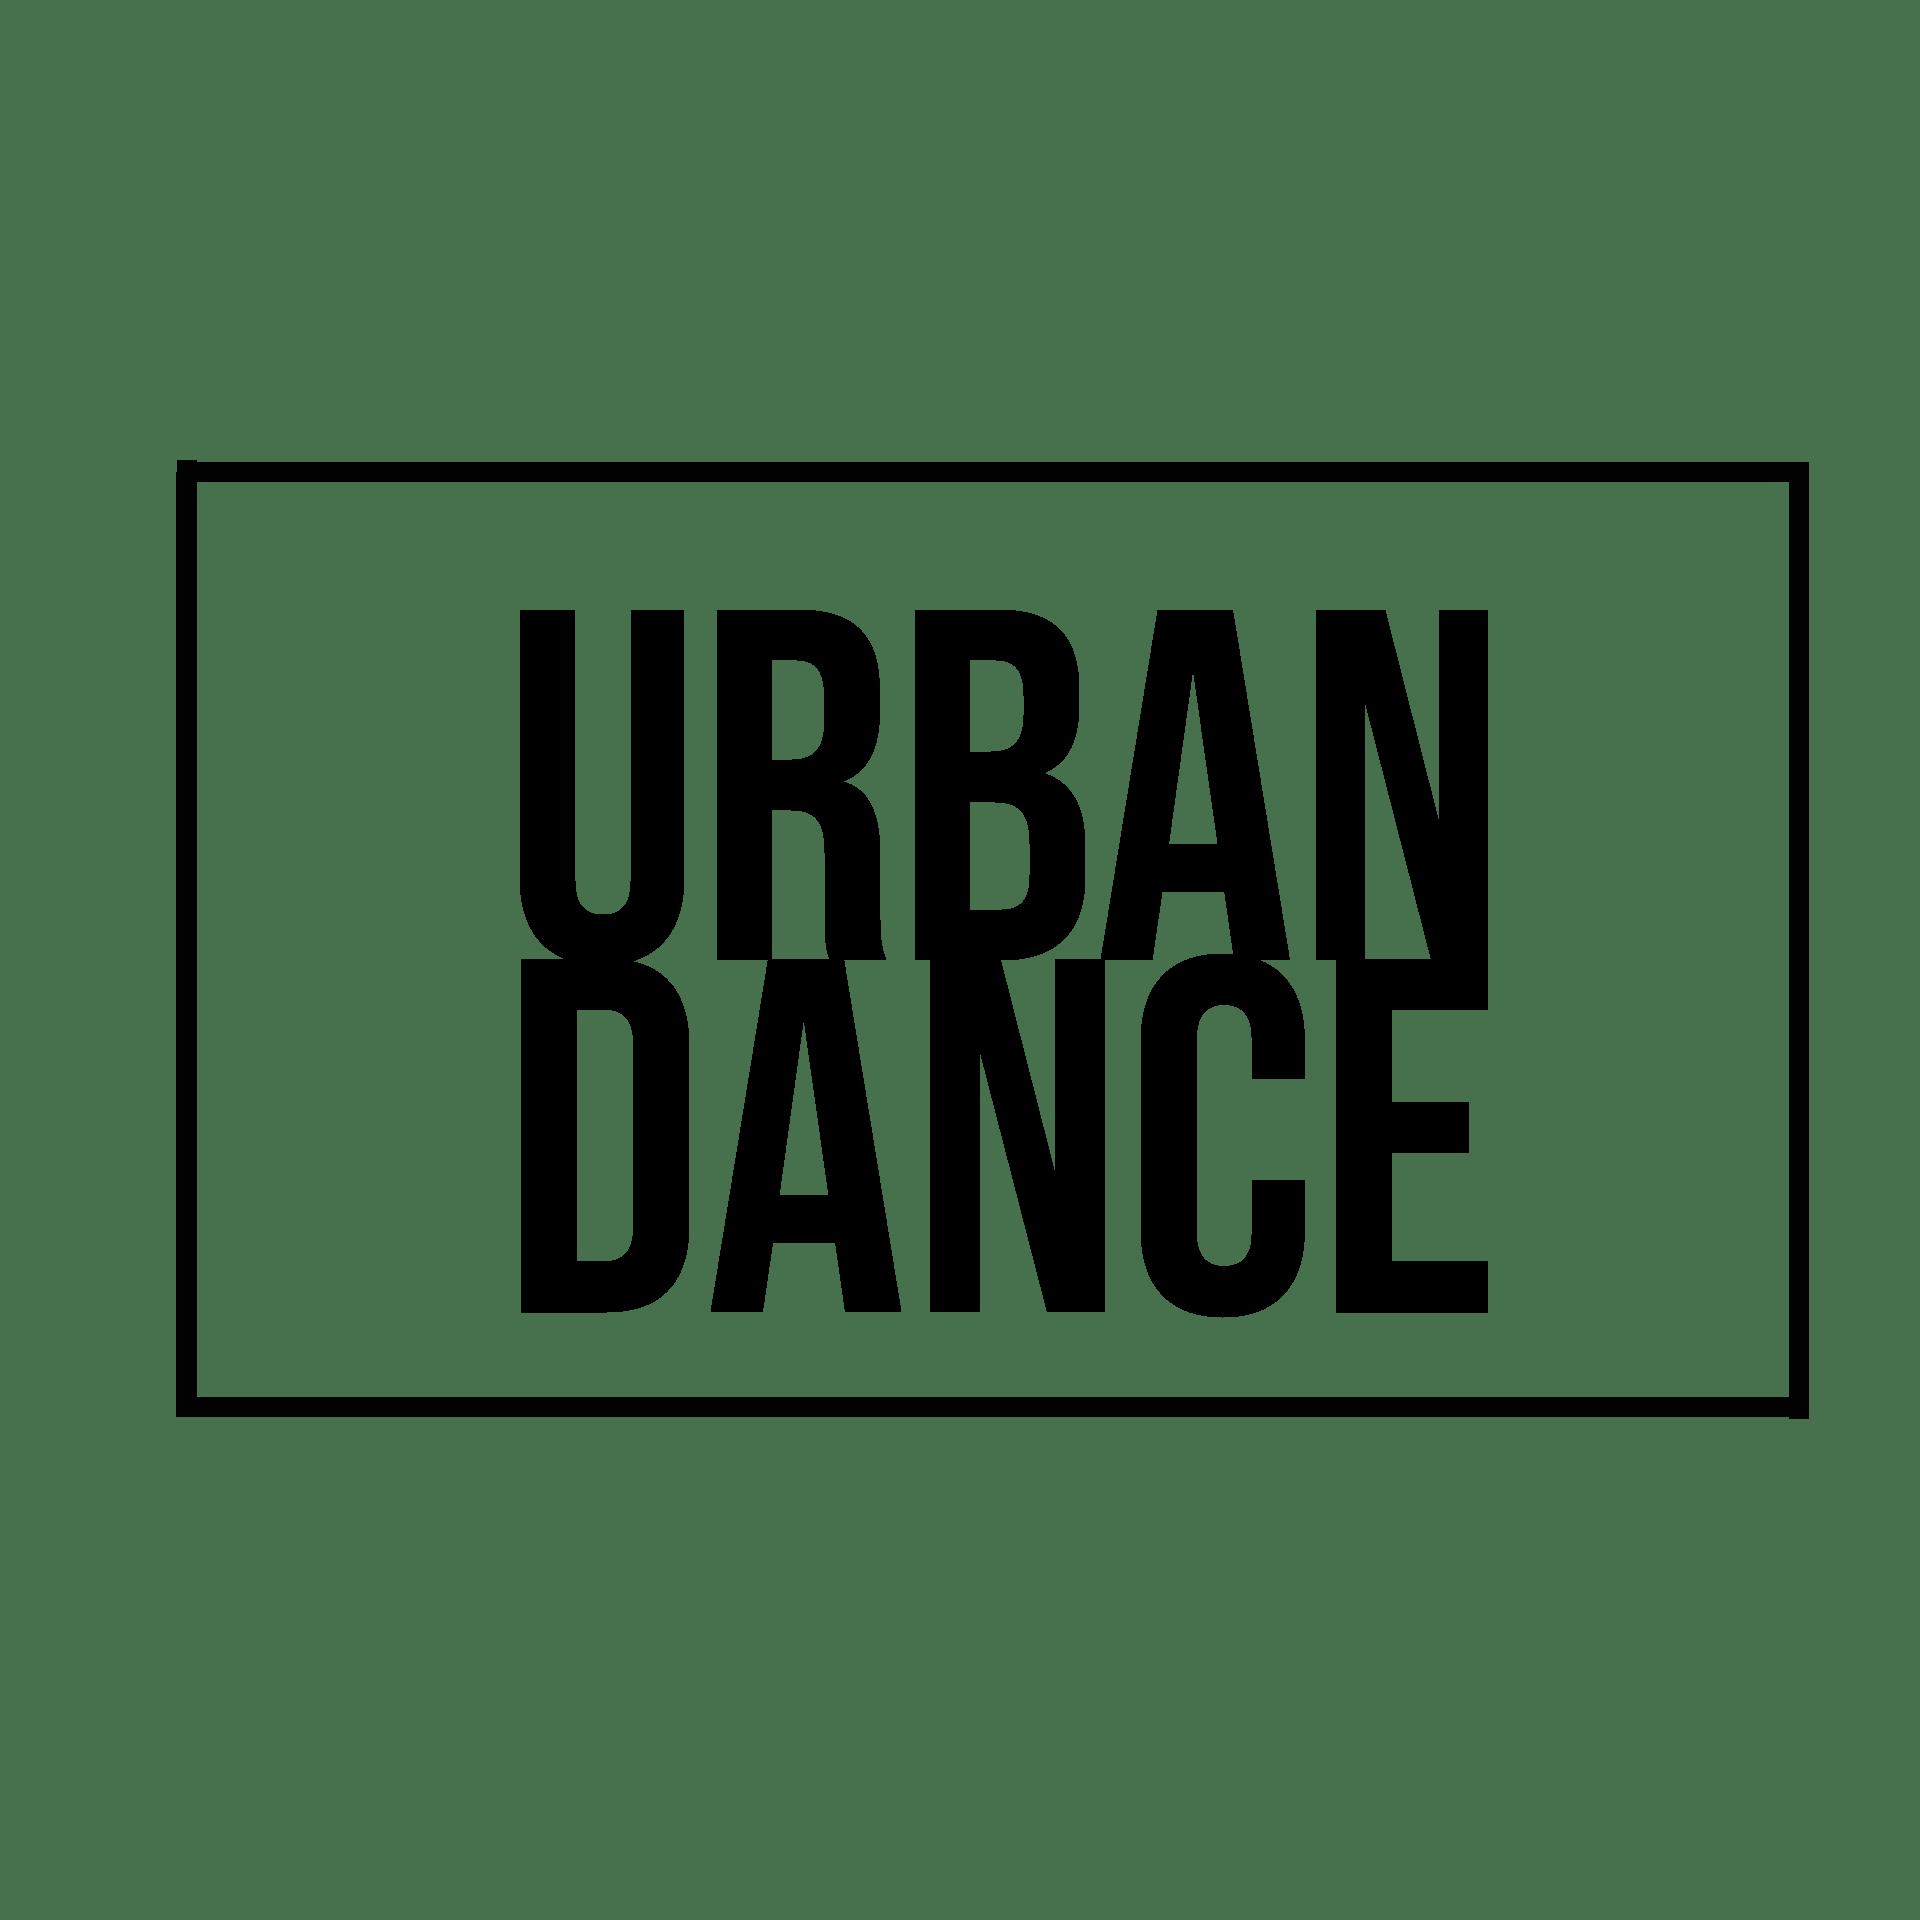 urbandance.at